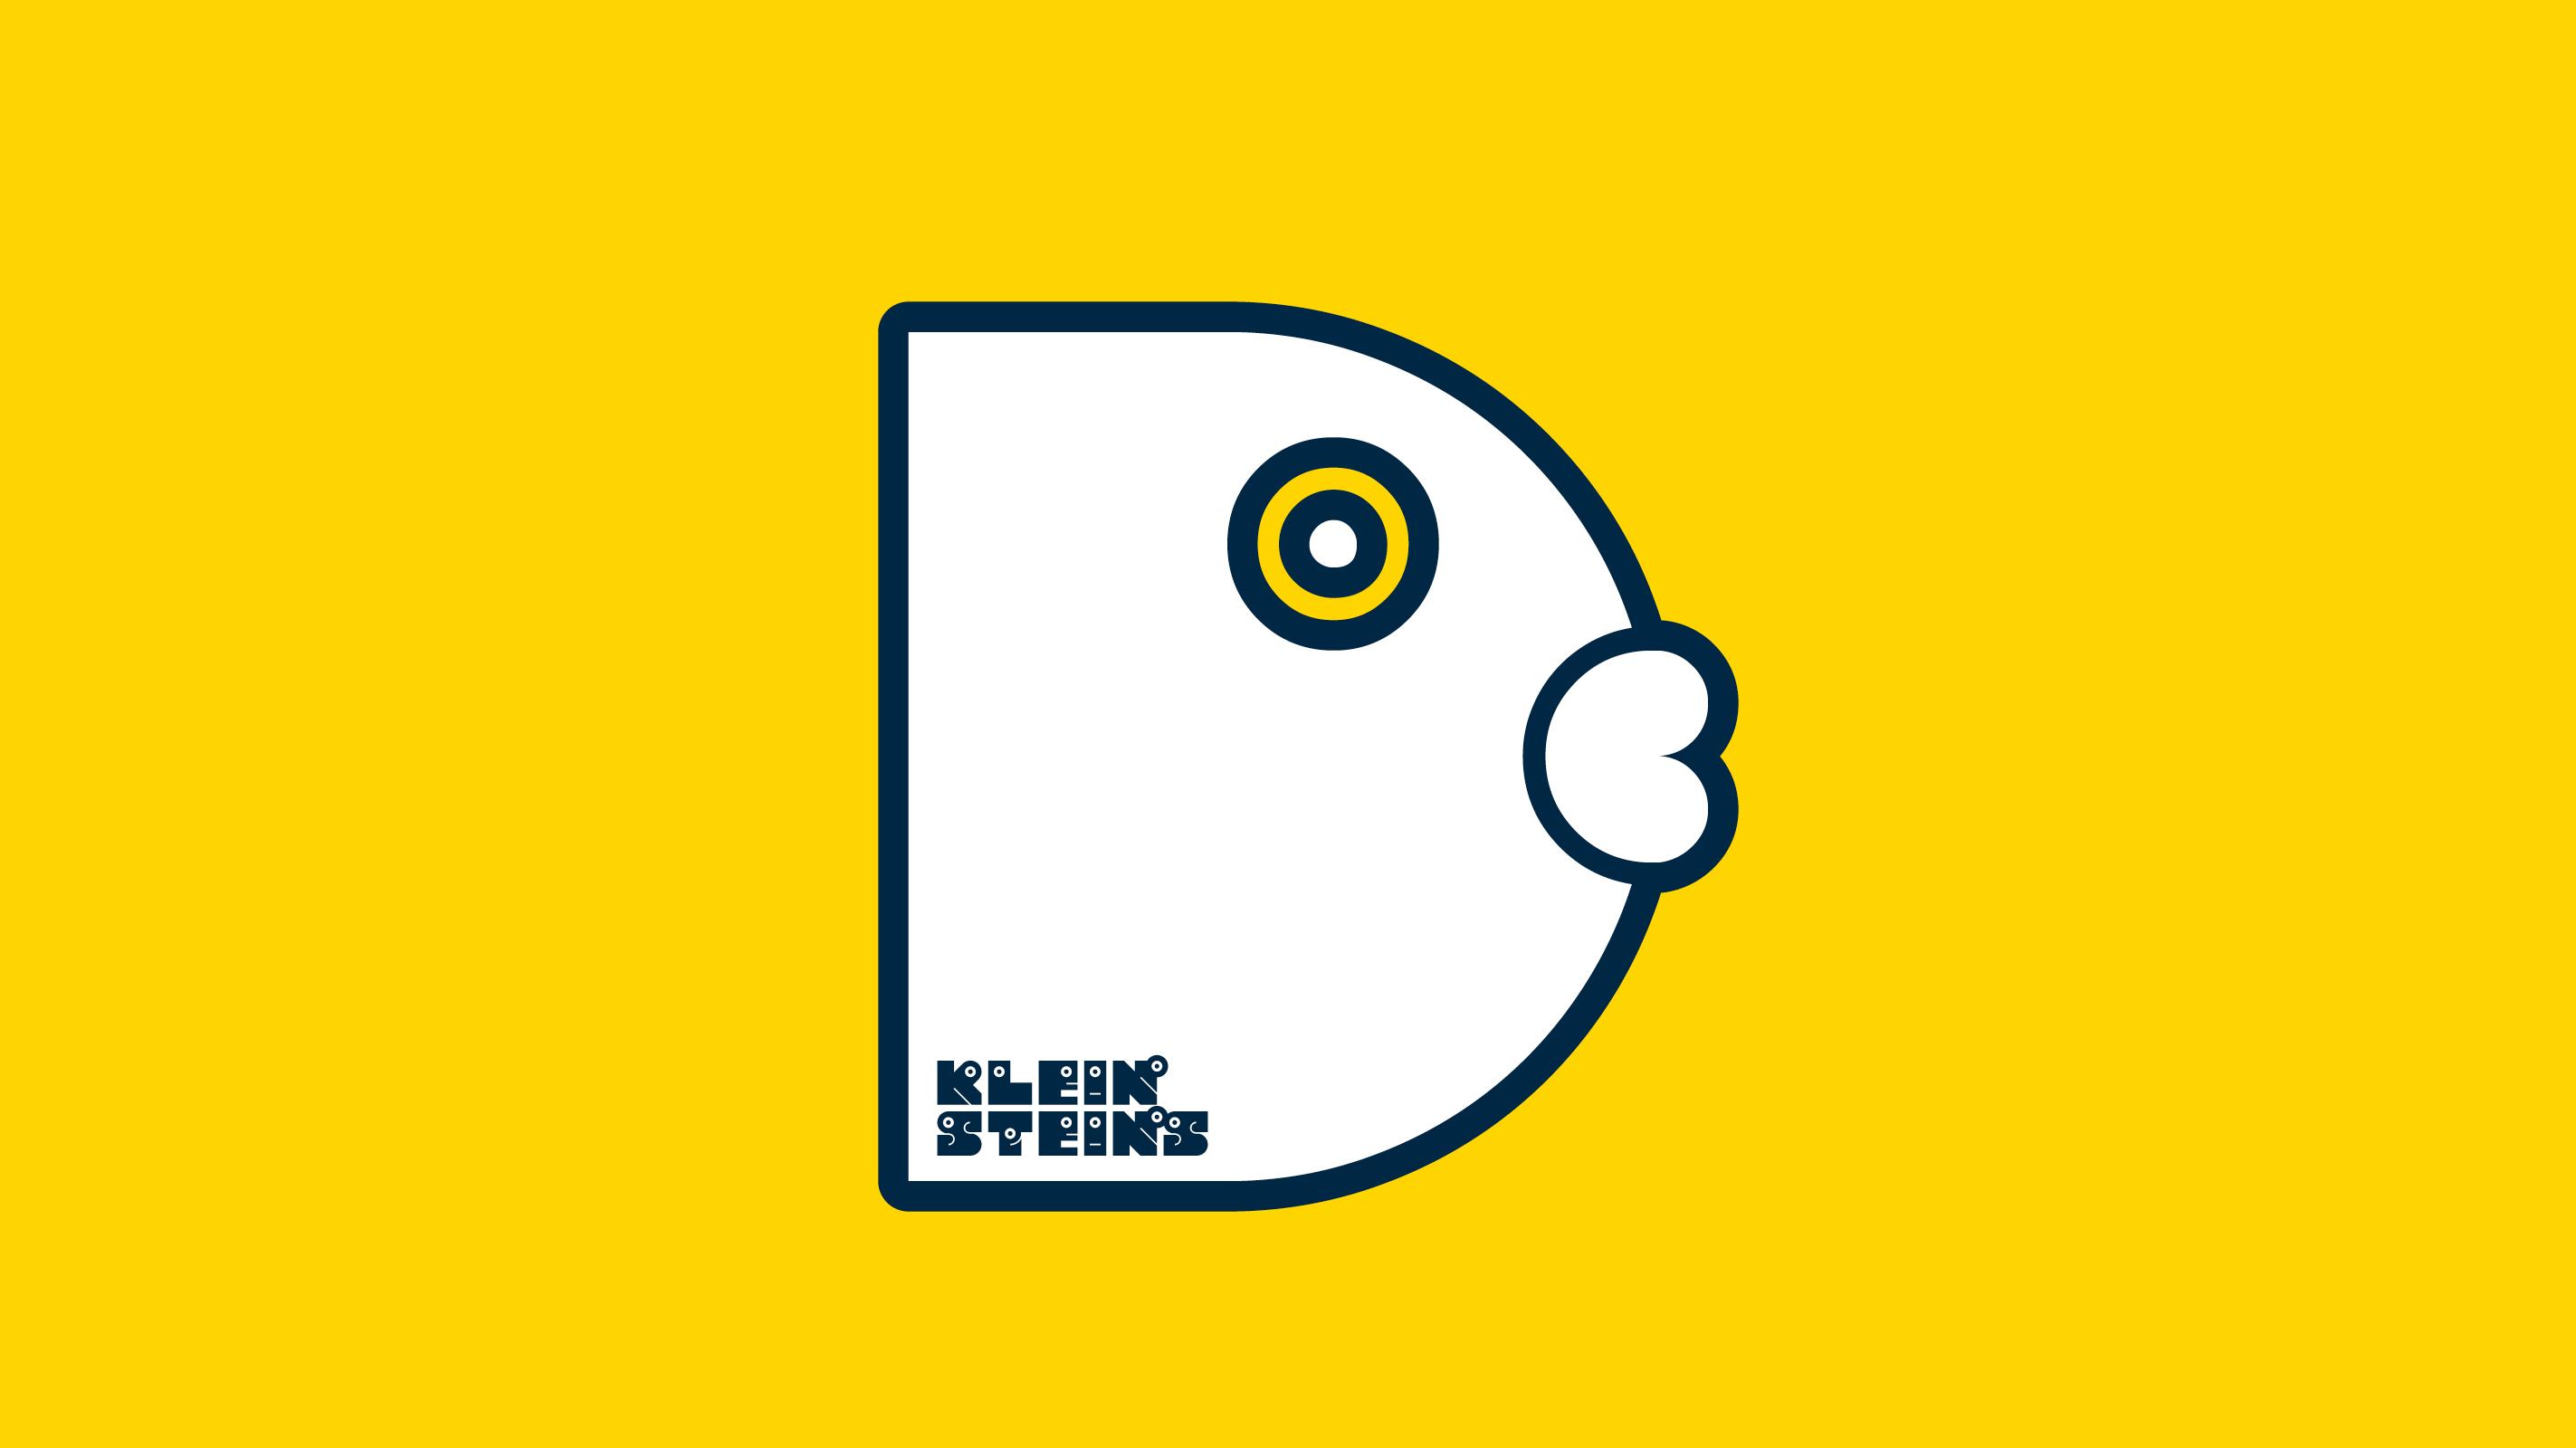 Kleinsteins Kita – Poarangan Brand Design5